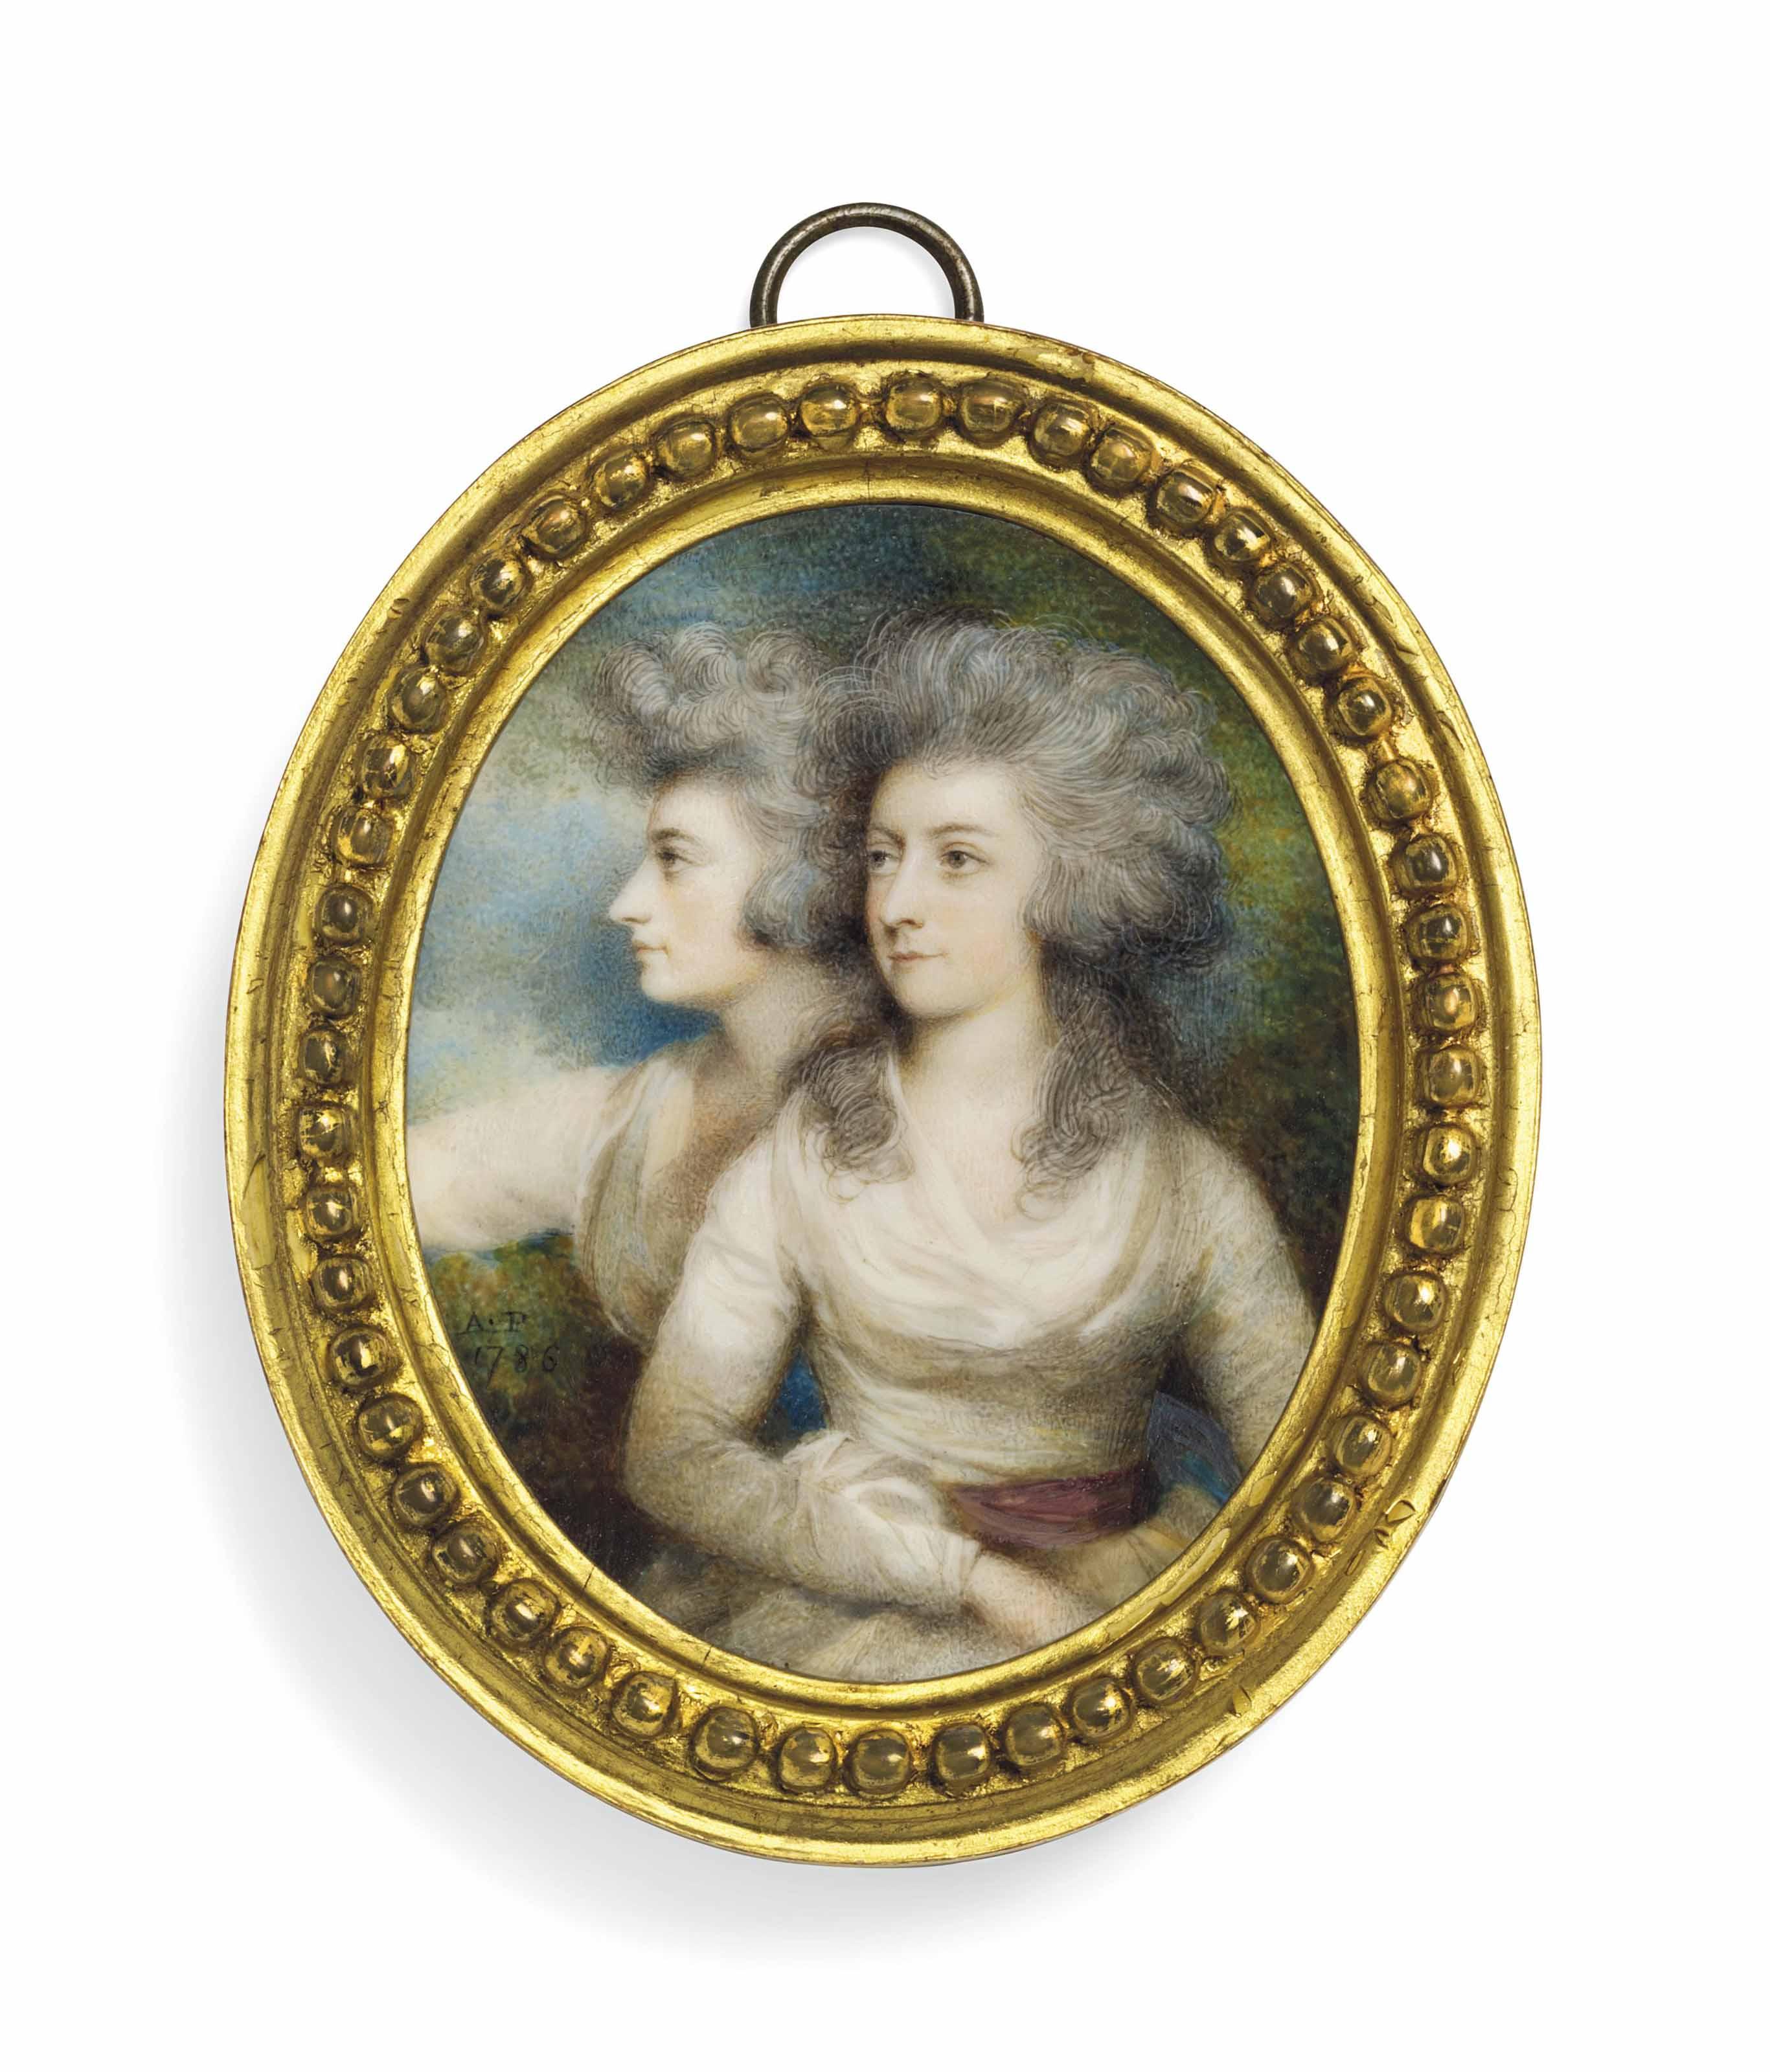 ANDREW PLIMER (BRITISH, 1763-1837)